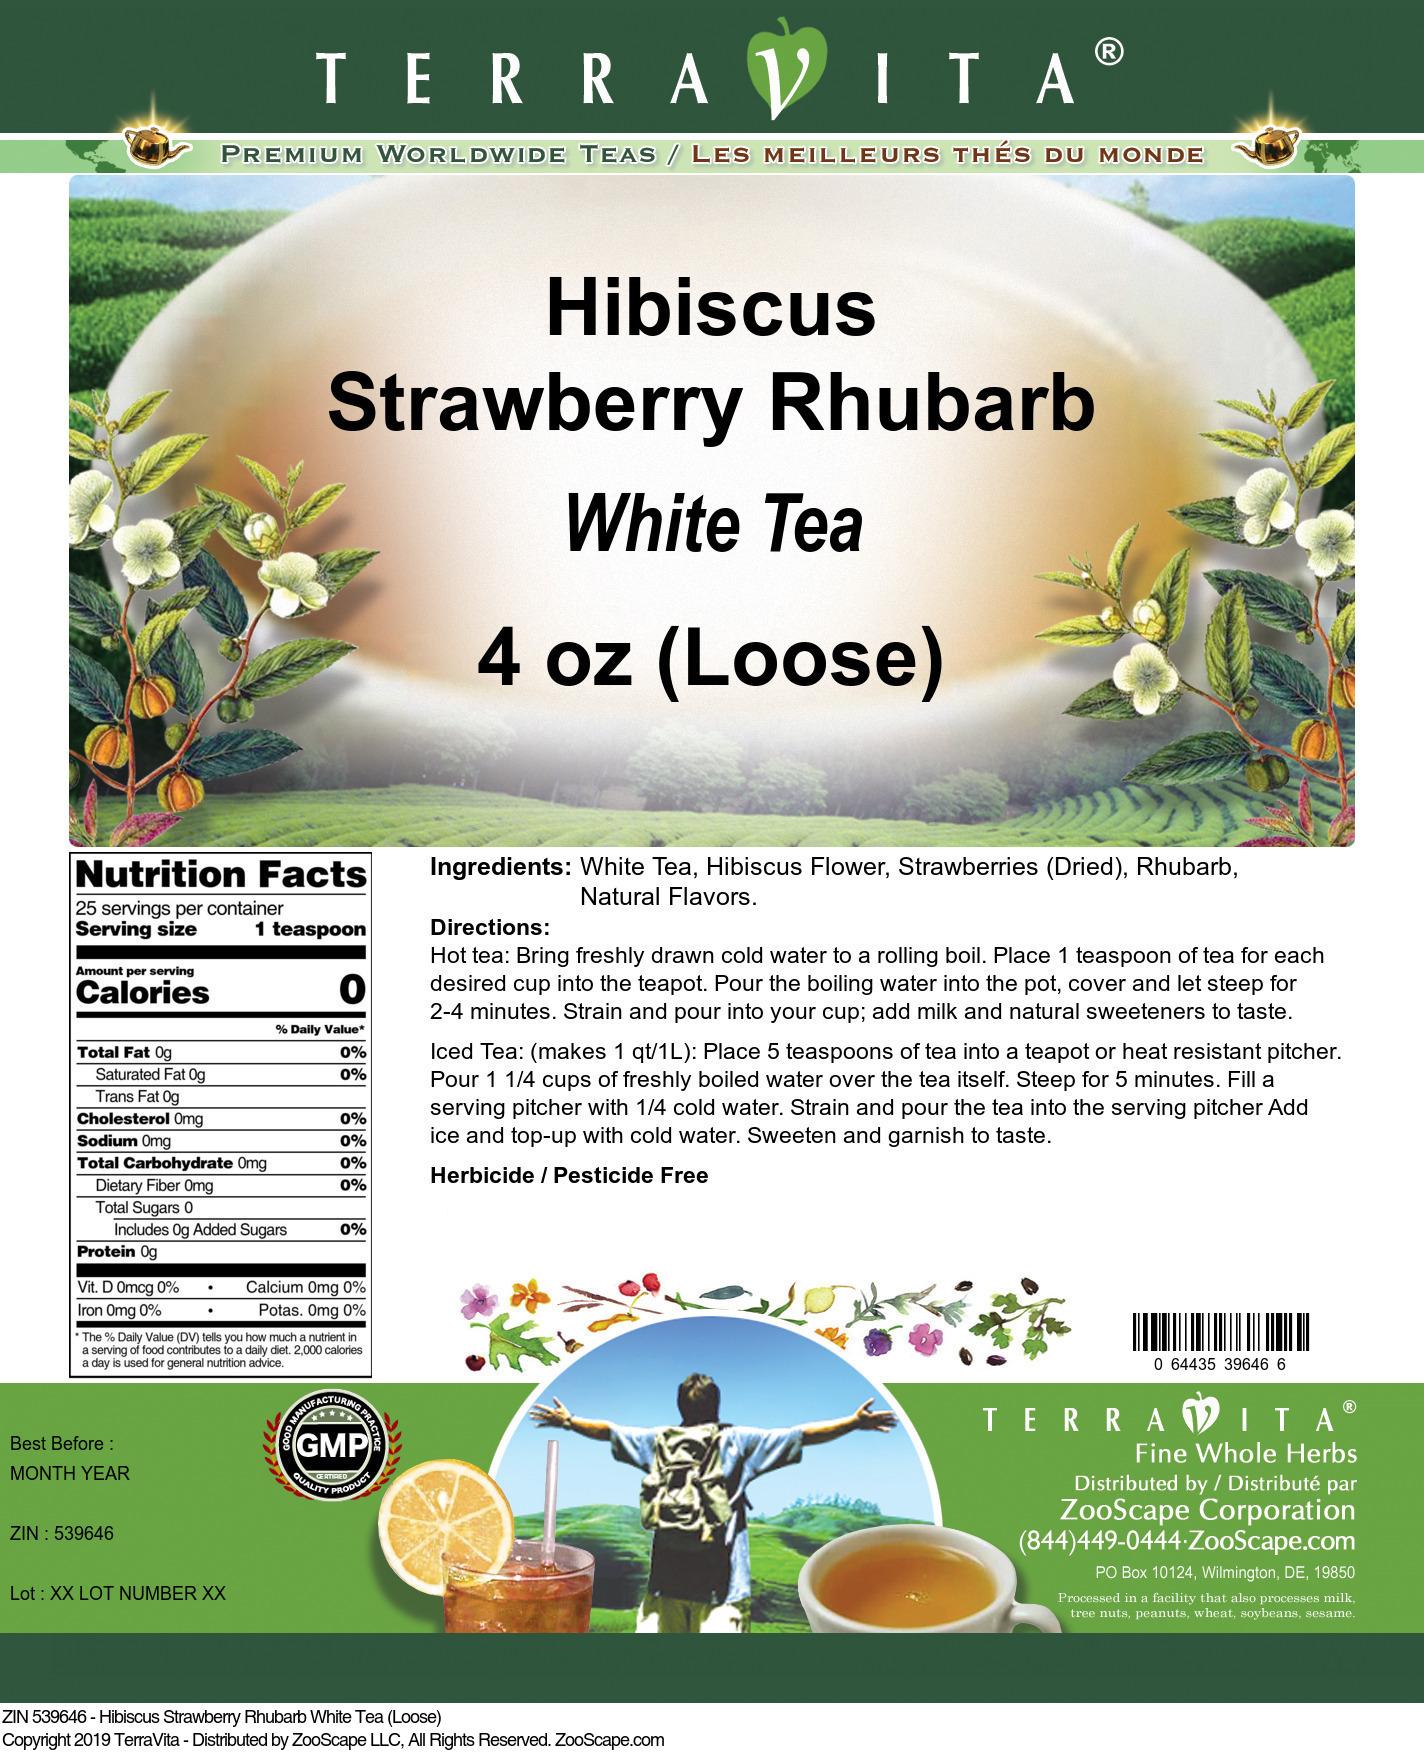 Hibiscus Strawberry Rhubarb White Tea